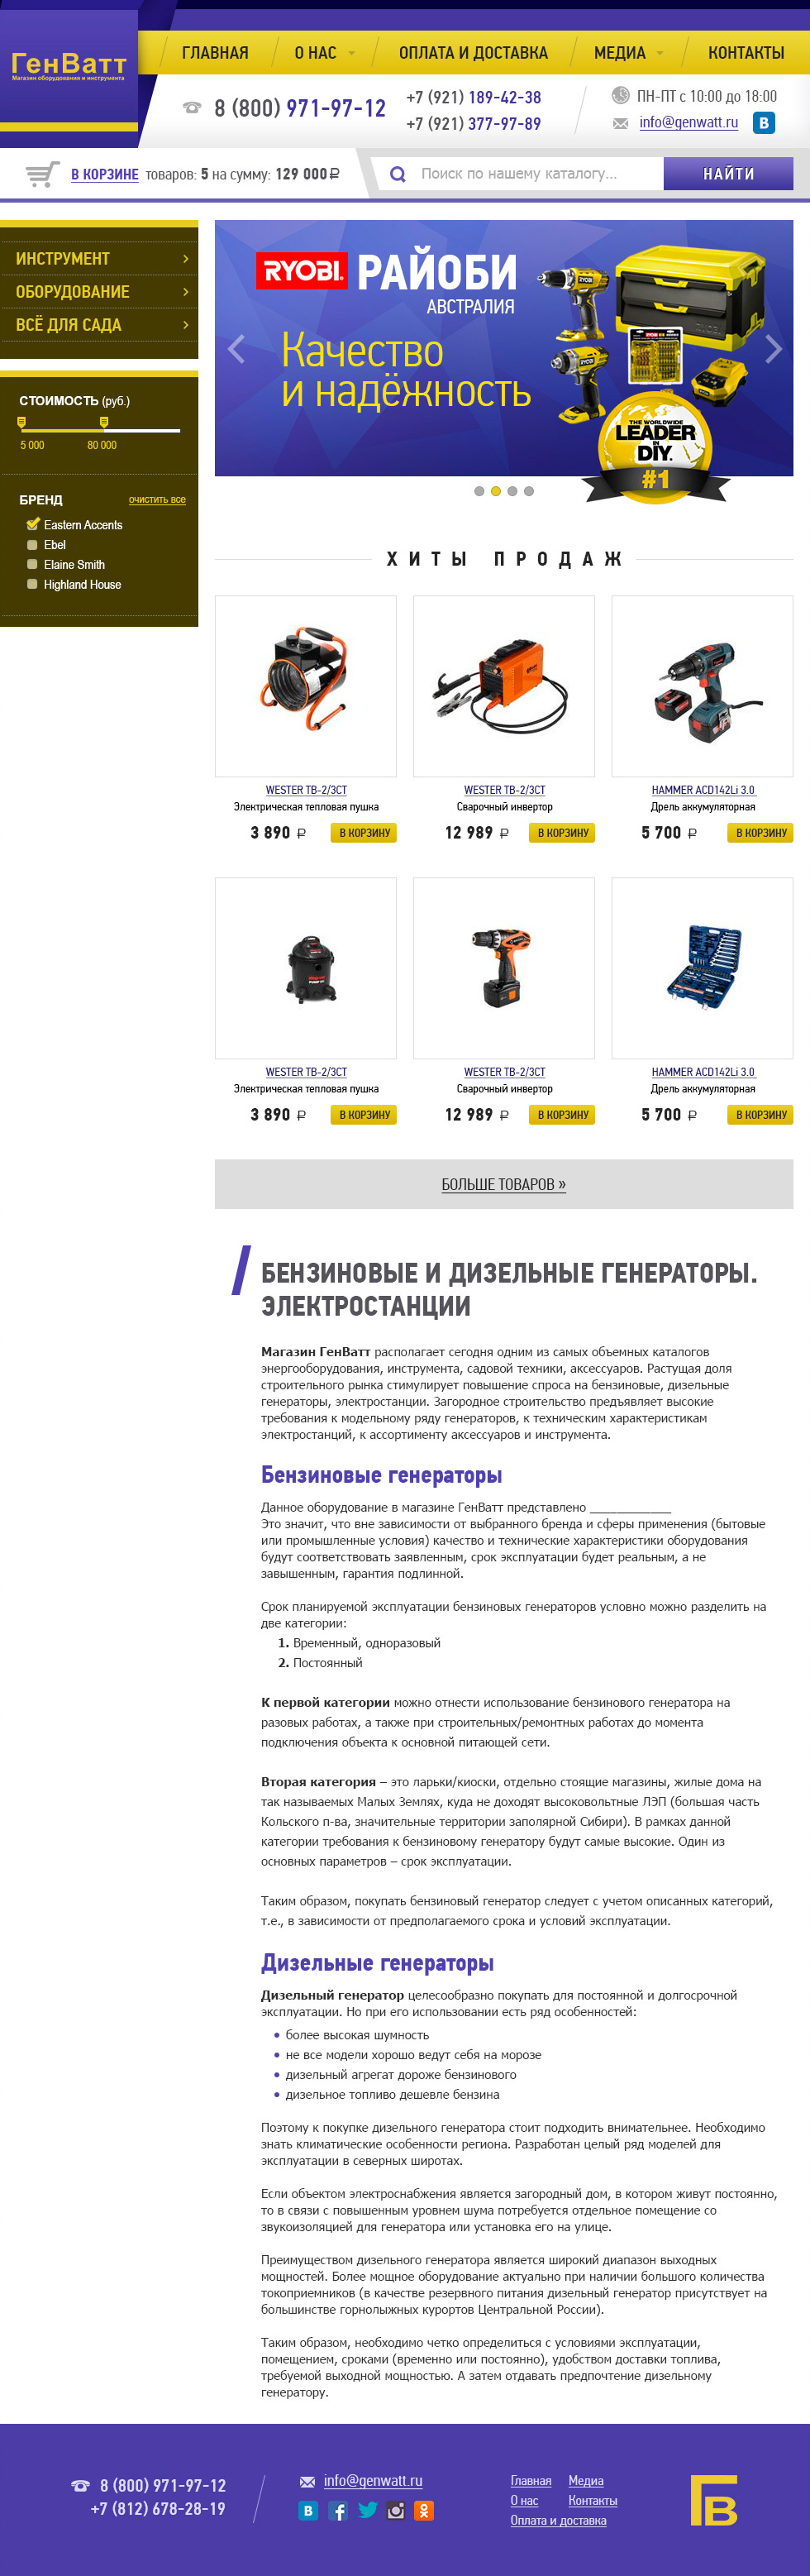 Сайт «Генватт»